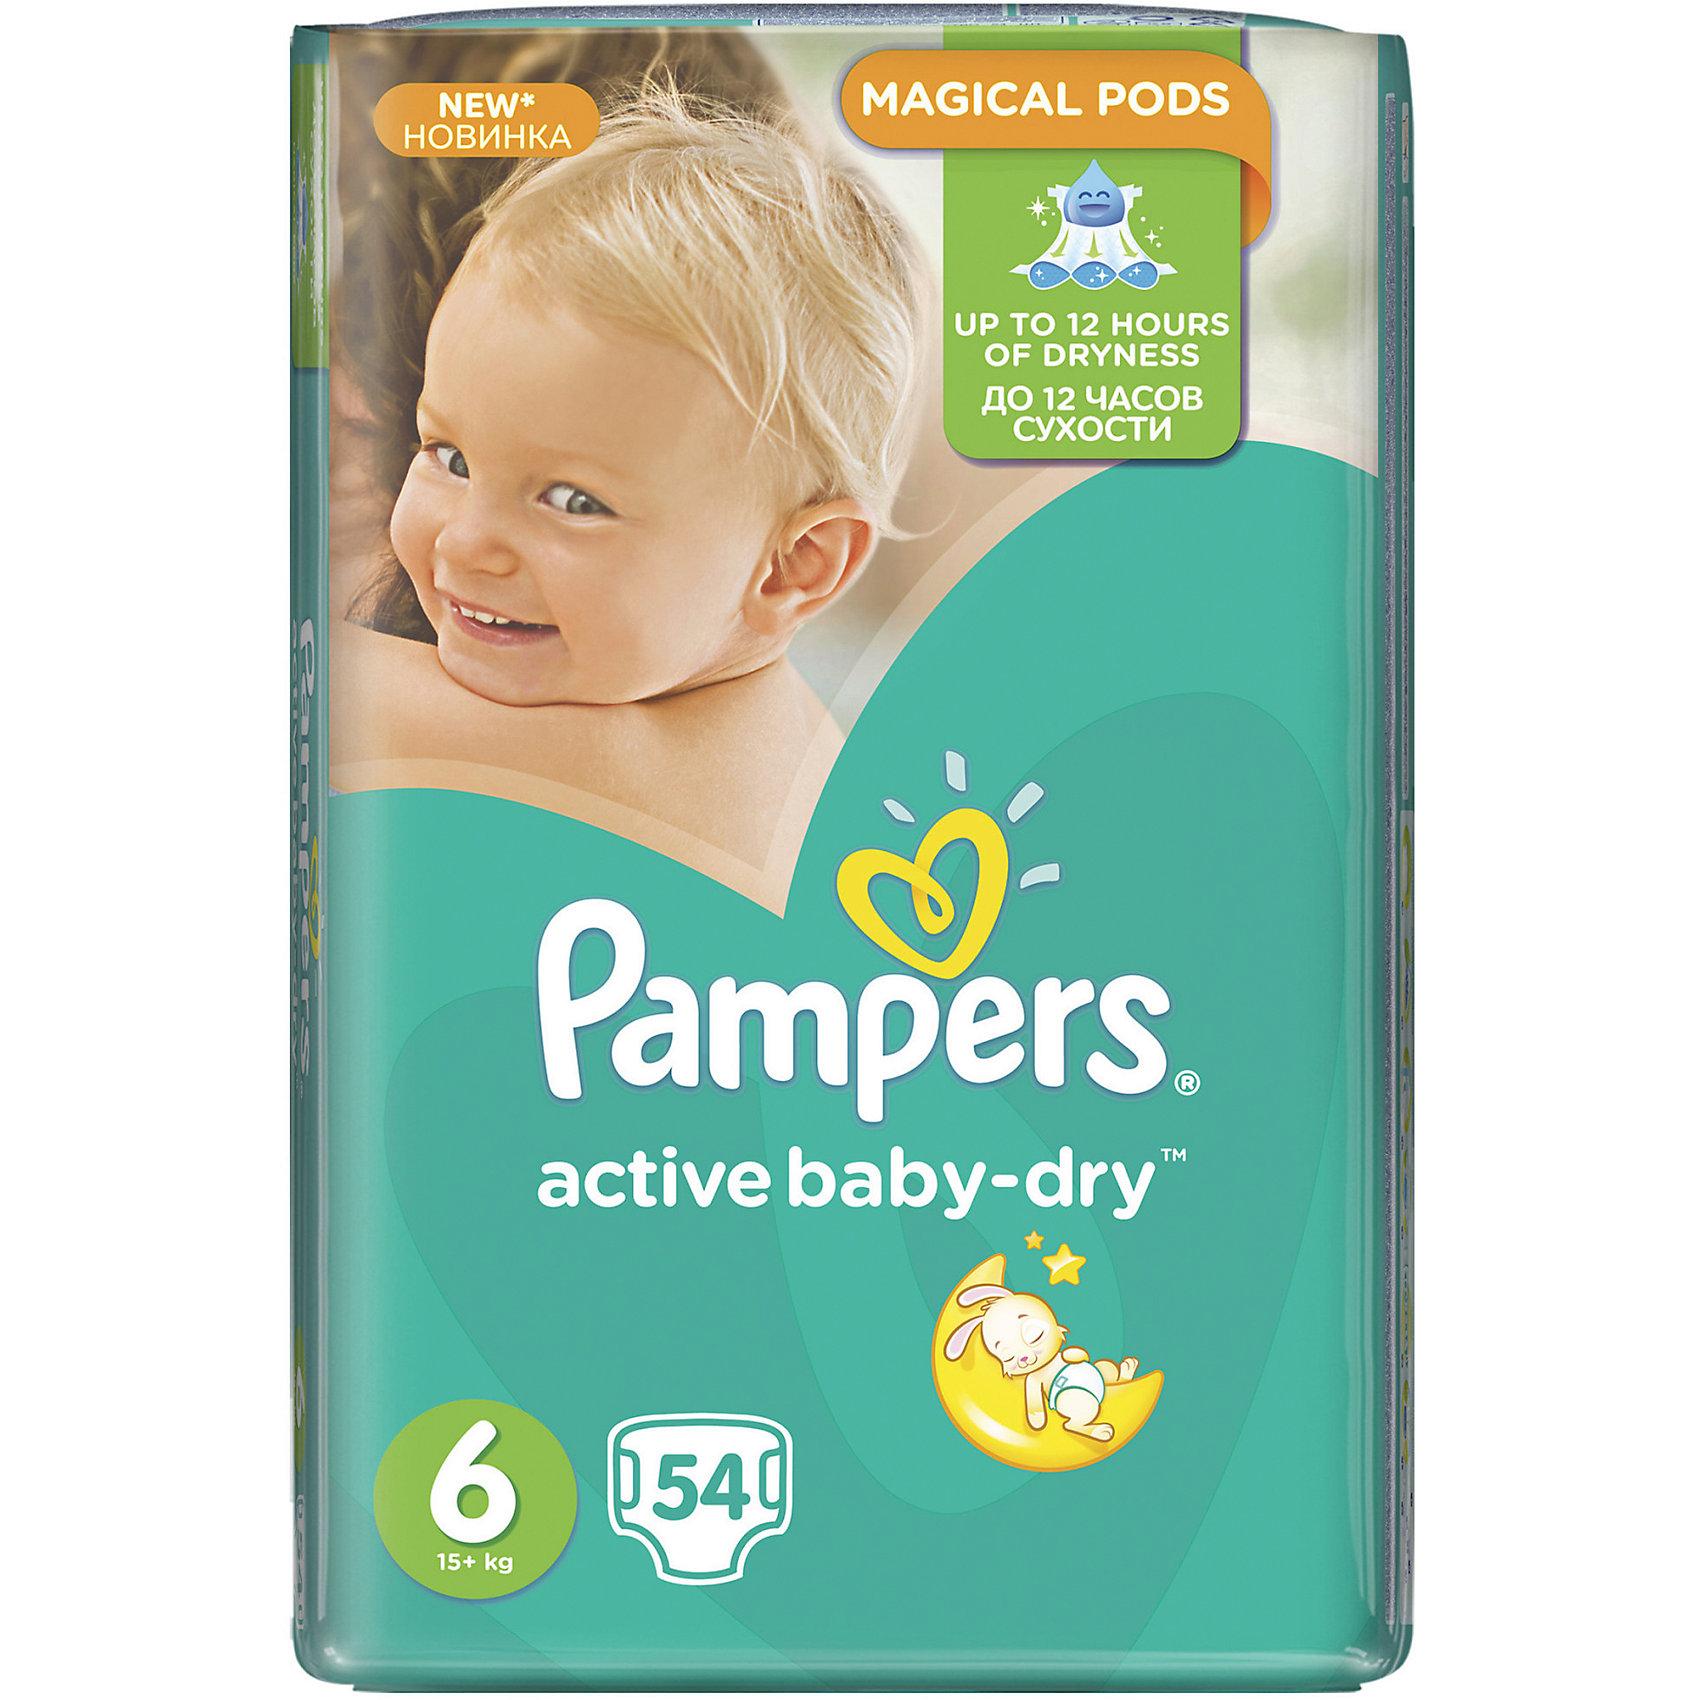 Подгузники Pampers Active Baby-Dry Extra Large, 15+ кг, 6 размер, 54 шт., PampersПодгузники более 12 кг.<br><br><br>Ширина мм: 465<br>Глубина мм: 125<br>Высота мм: 253<br>Вес г: 2269<br>Возраст от месяцев: 24<br>Возраст до месяцев: 36<br>Пол: Унисекс<br>Возраст: Детский<br>SKU: 5516305